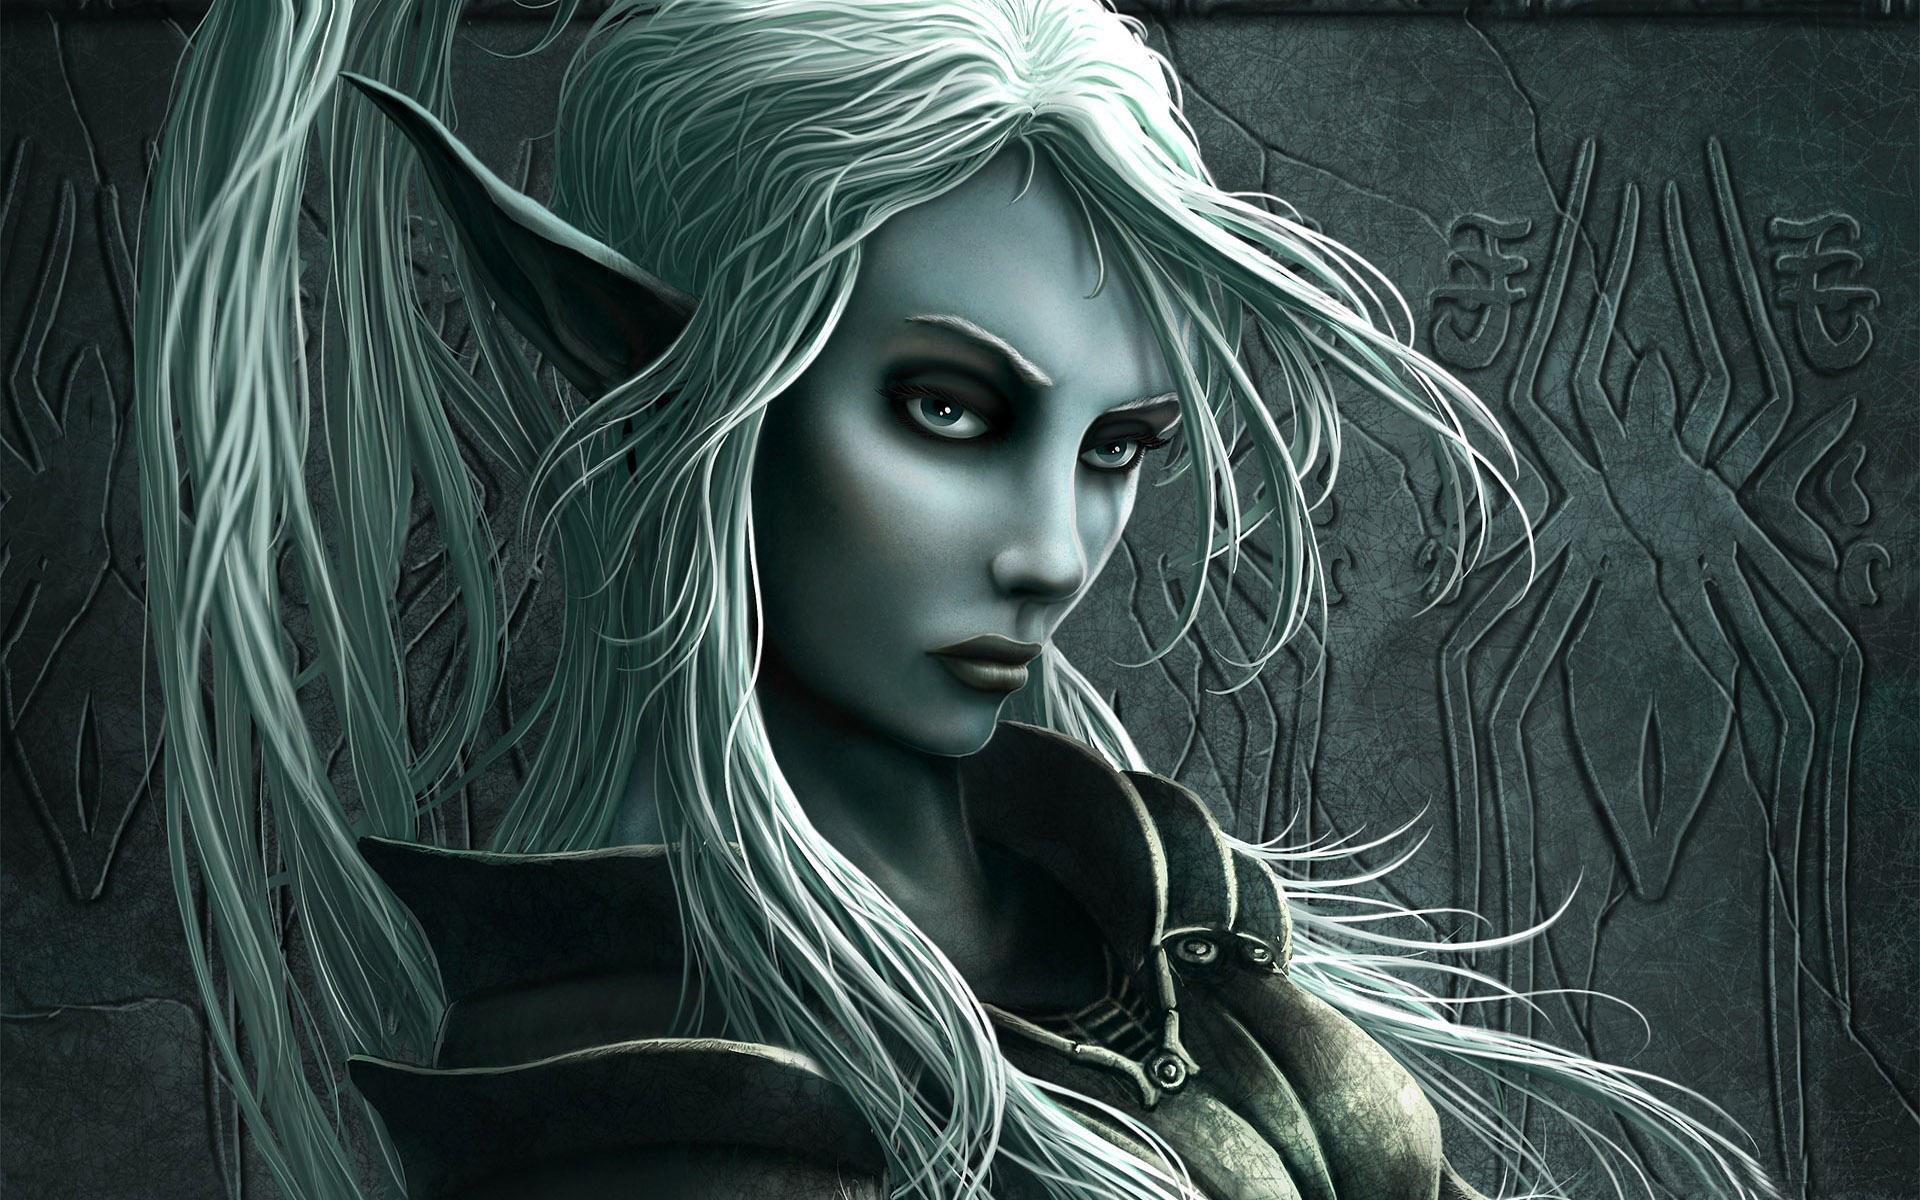 Elf woman wallpapers Elf woman stock photos 1920x1200